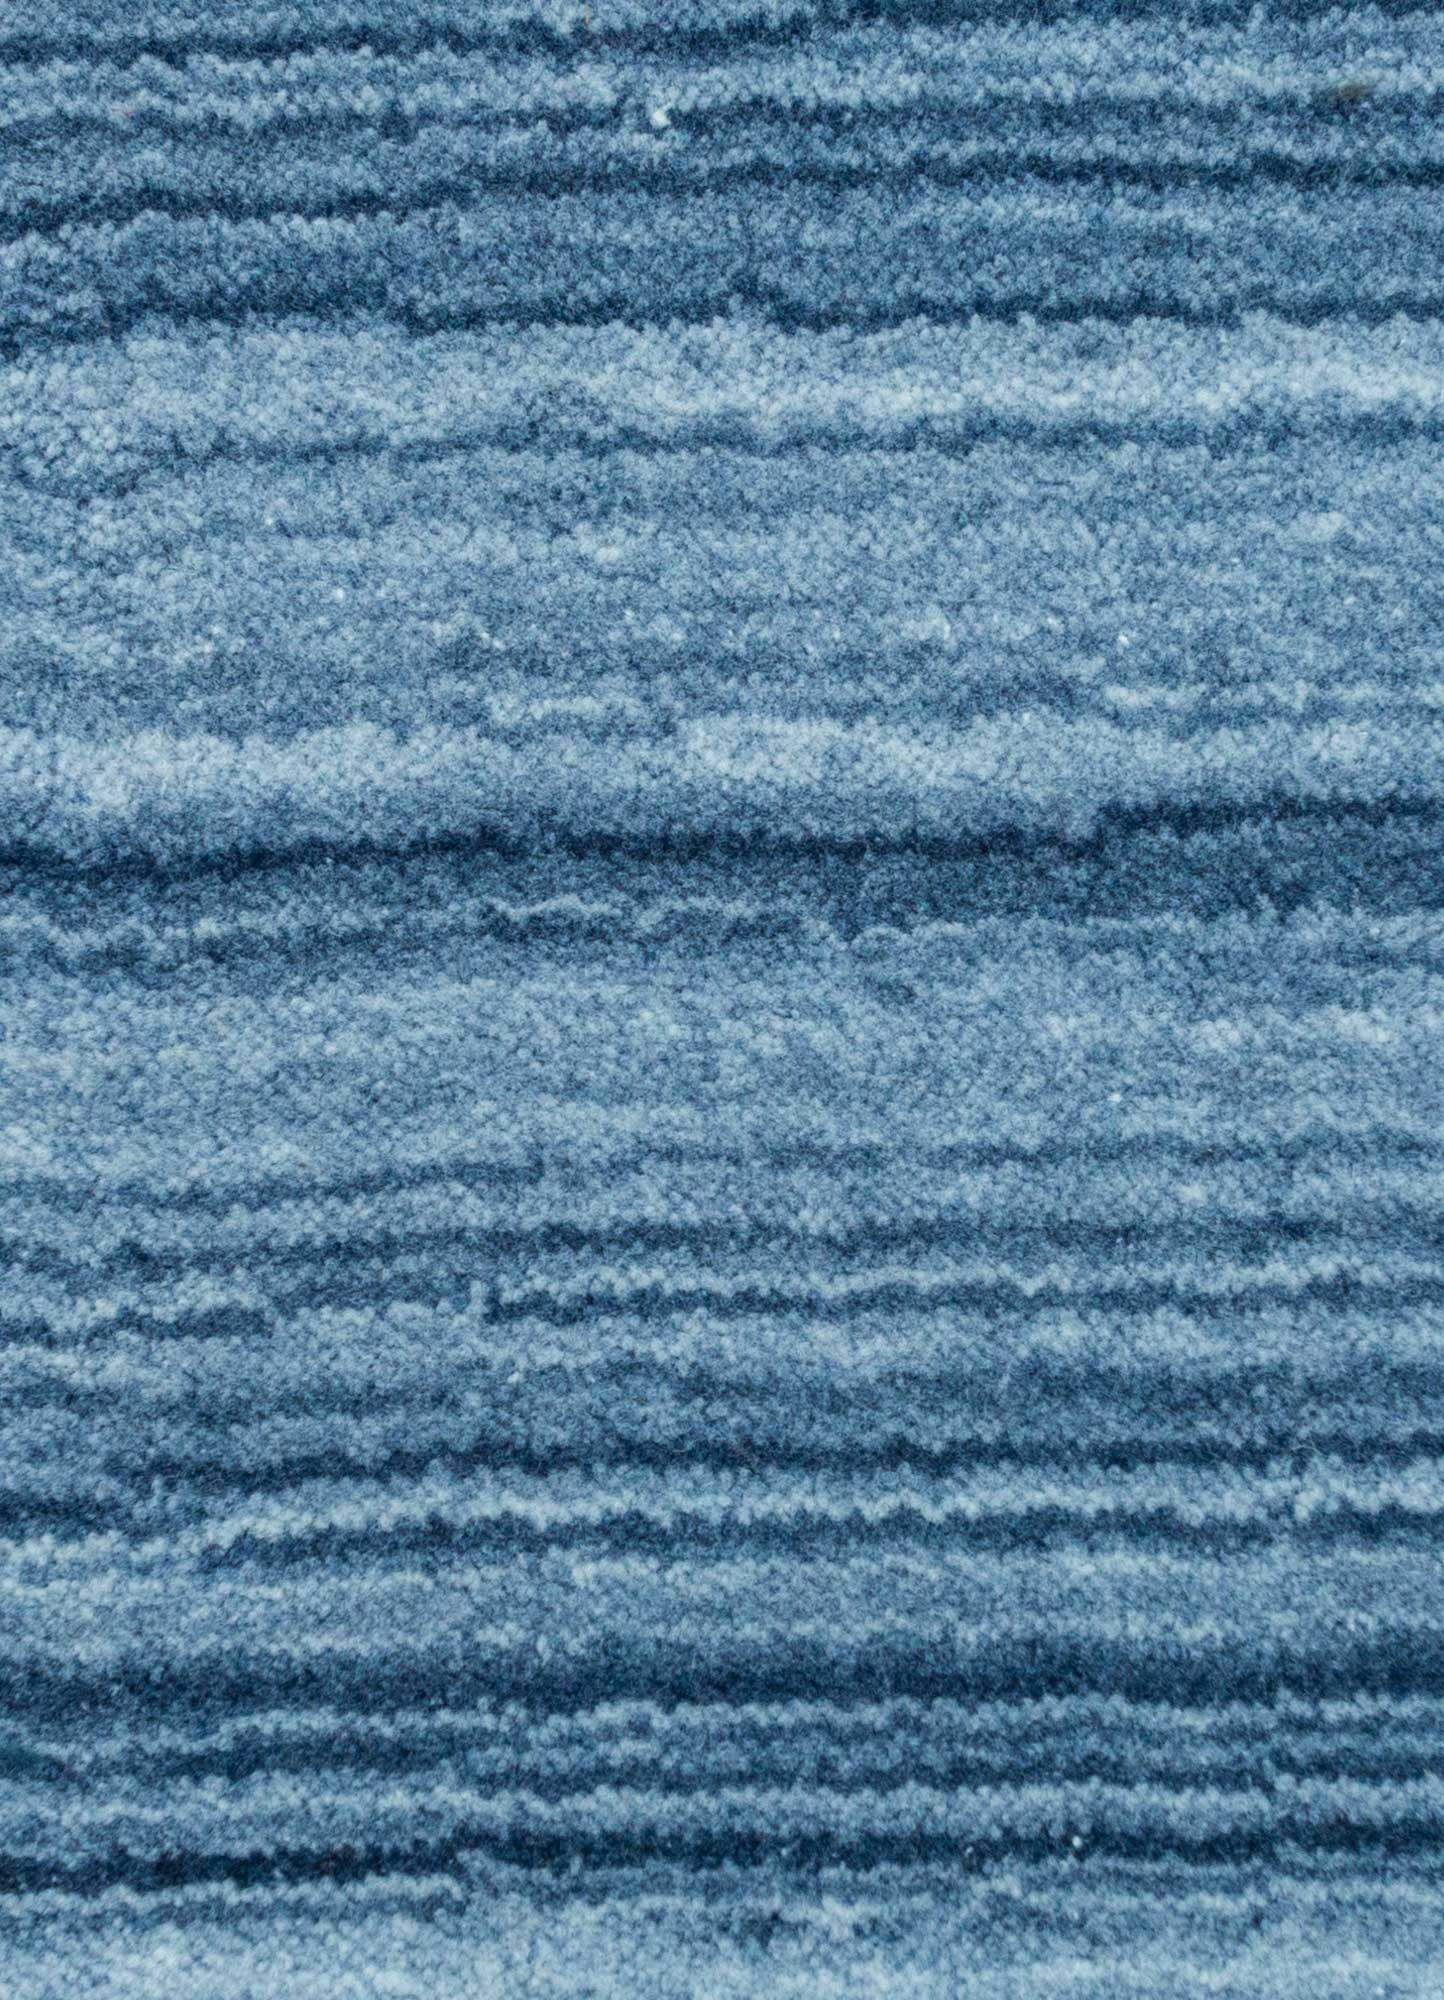 tesoro blue polyester hand loom Rug - CloseUp